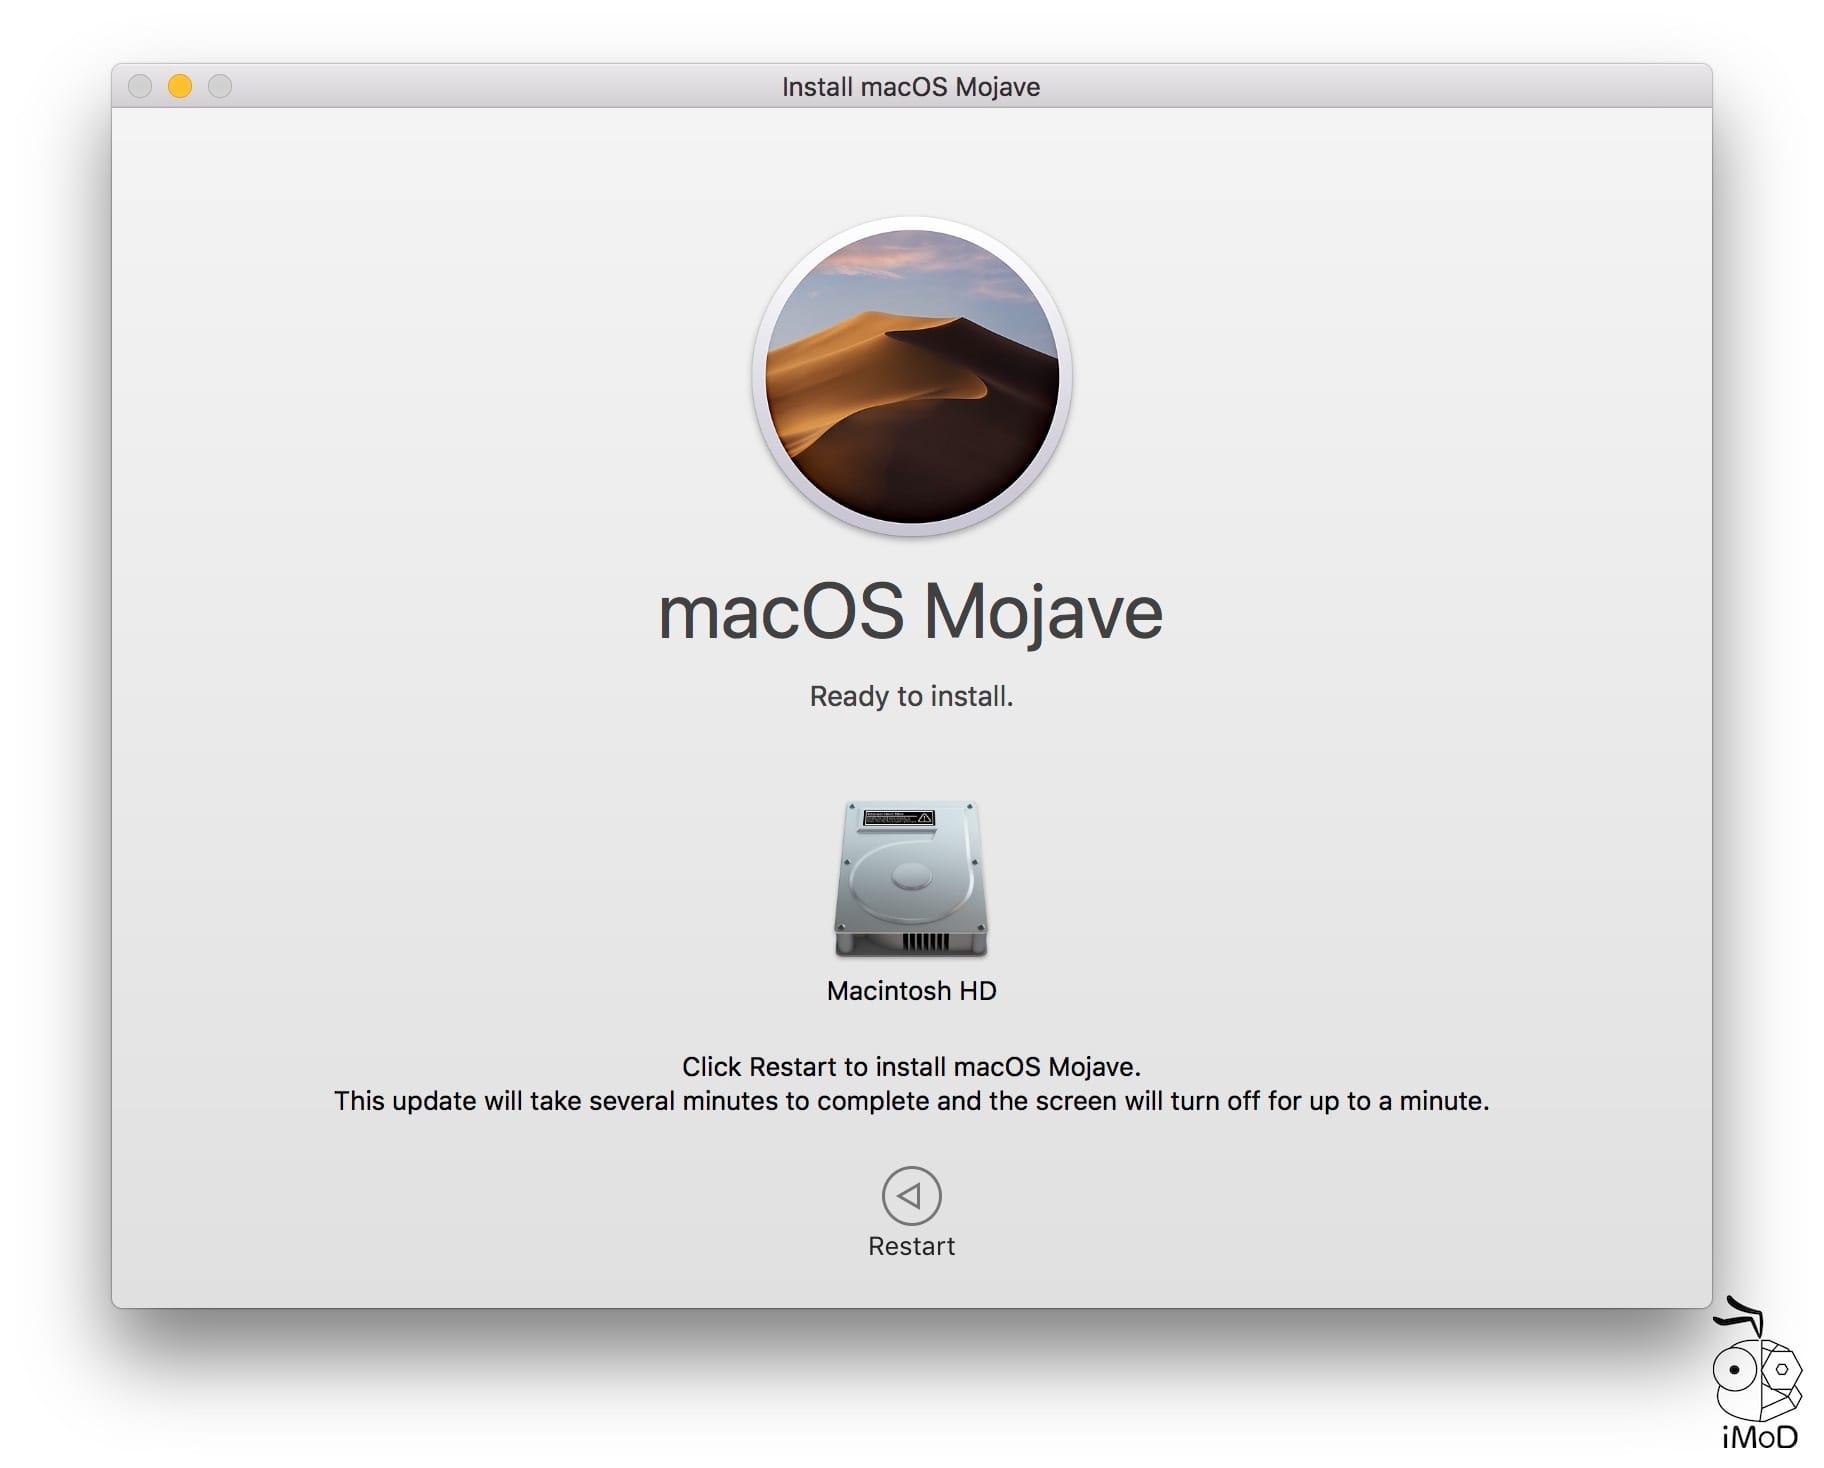 Install Macos Mojave Screenshot 2018 10 01 10.04.58